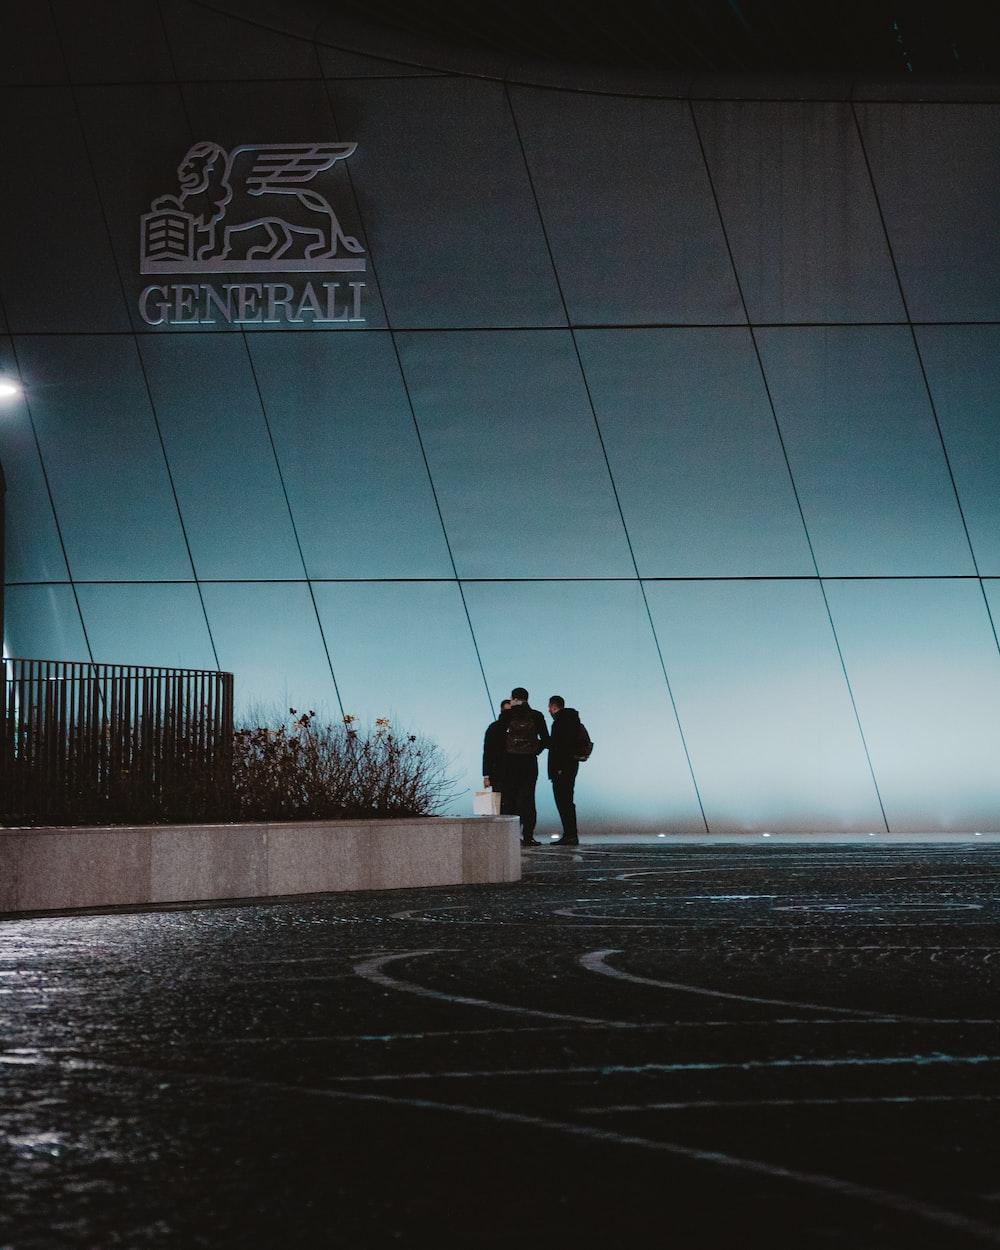 people near Generali building during night